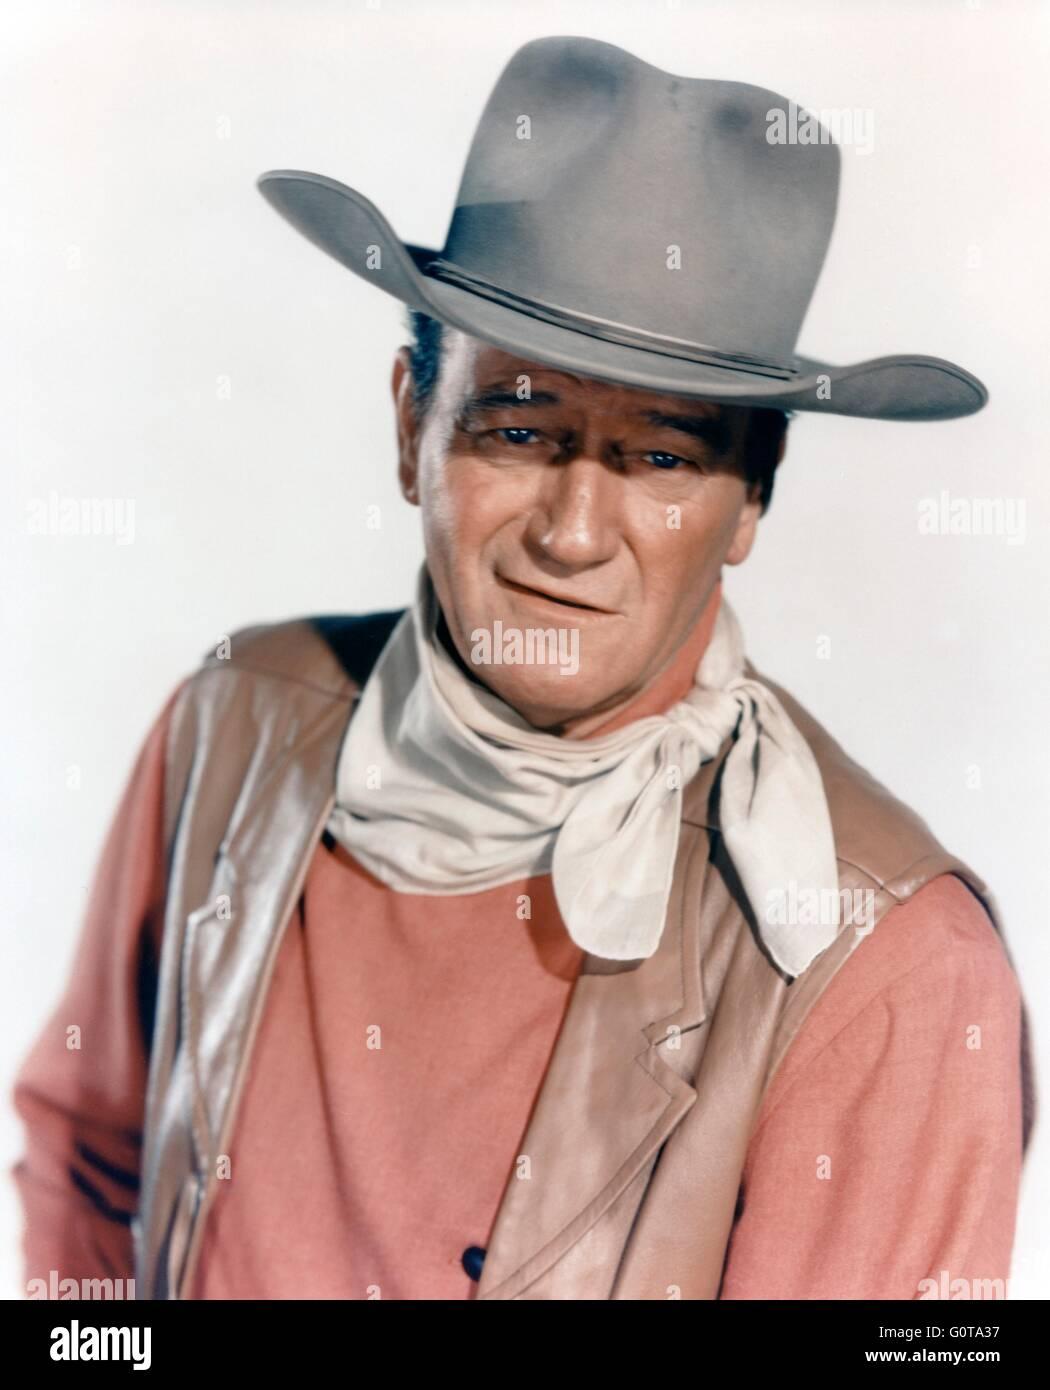 John Wayne  / McLINTOCK ! / 1963 directed byAndrew V. McLaglen [United Artists] - Stock Image